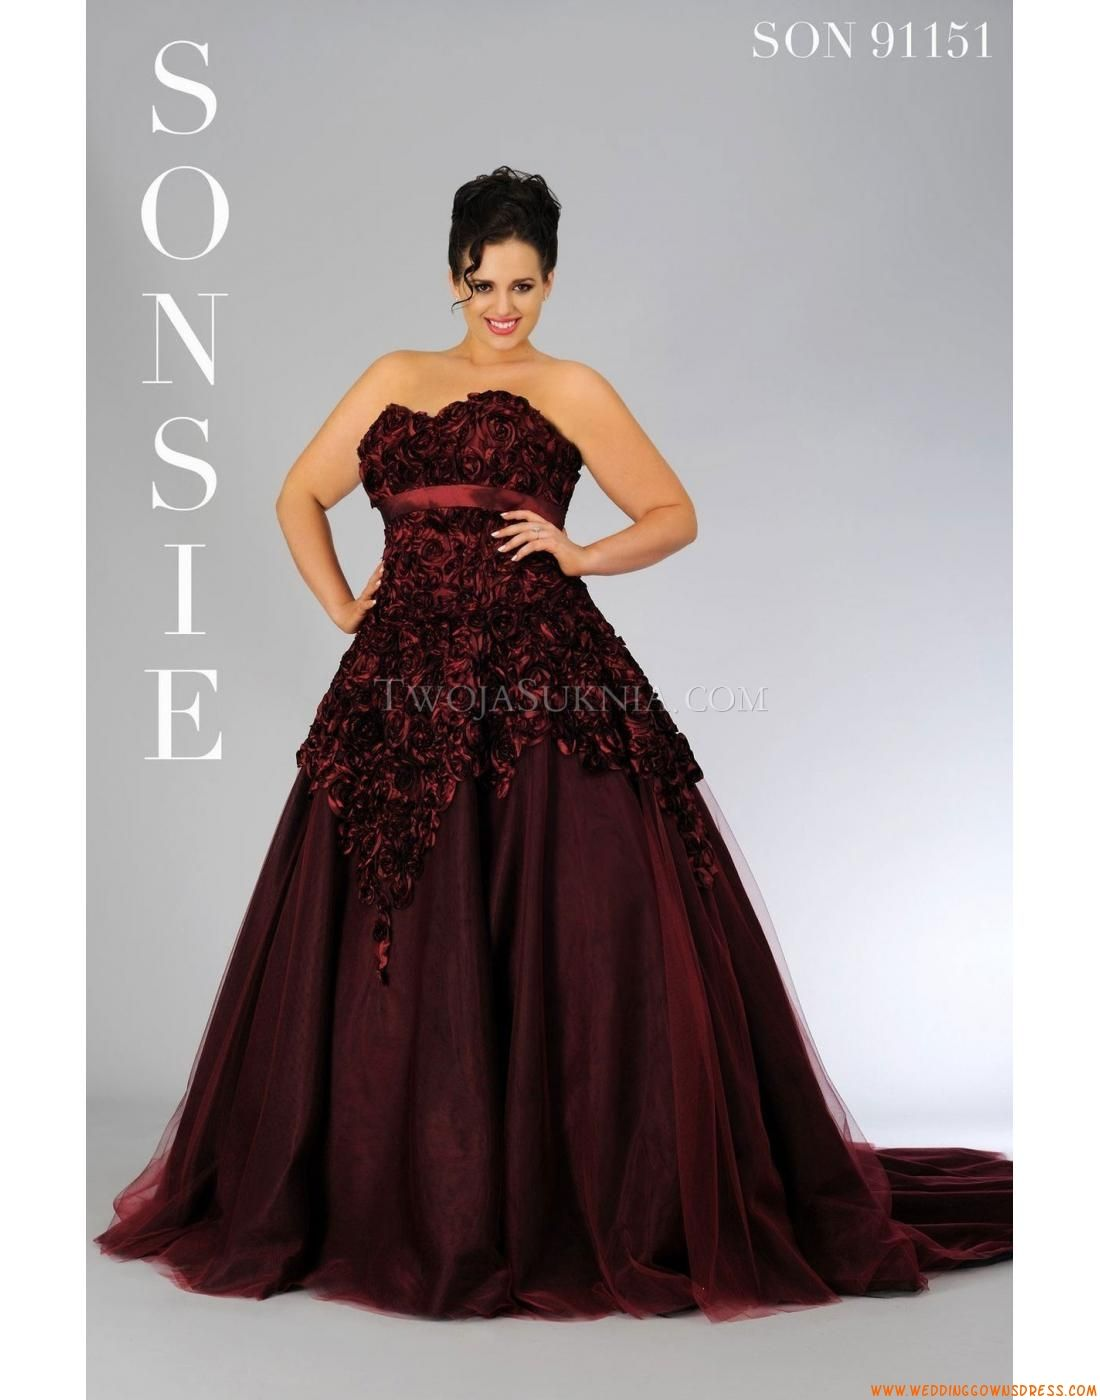 Wedding Dress Veromia SON 91151 Sonsie | wedding dresses toronto ...